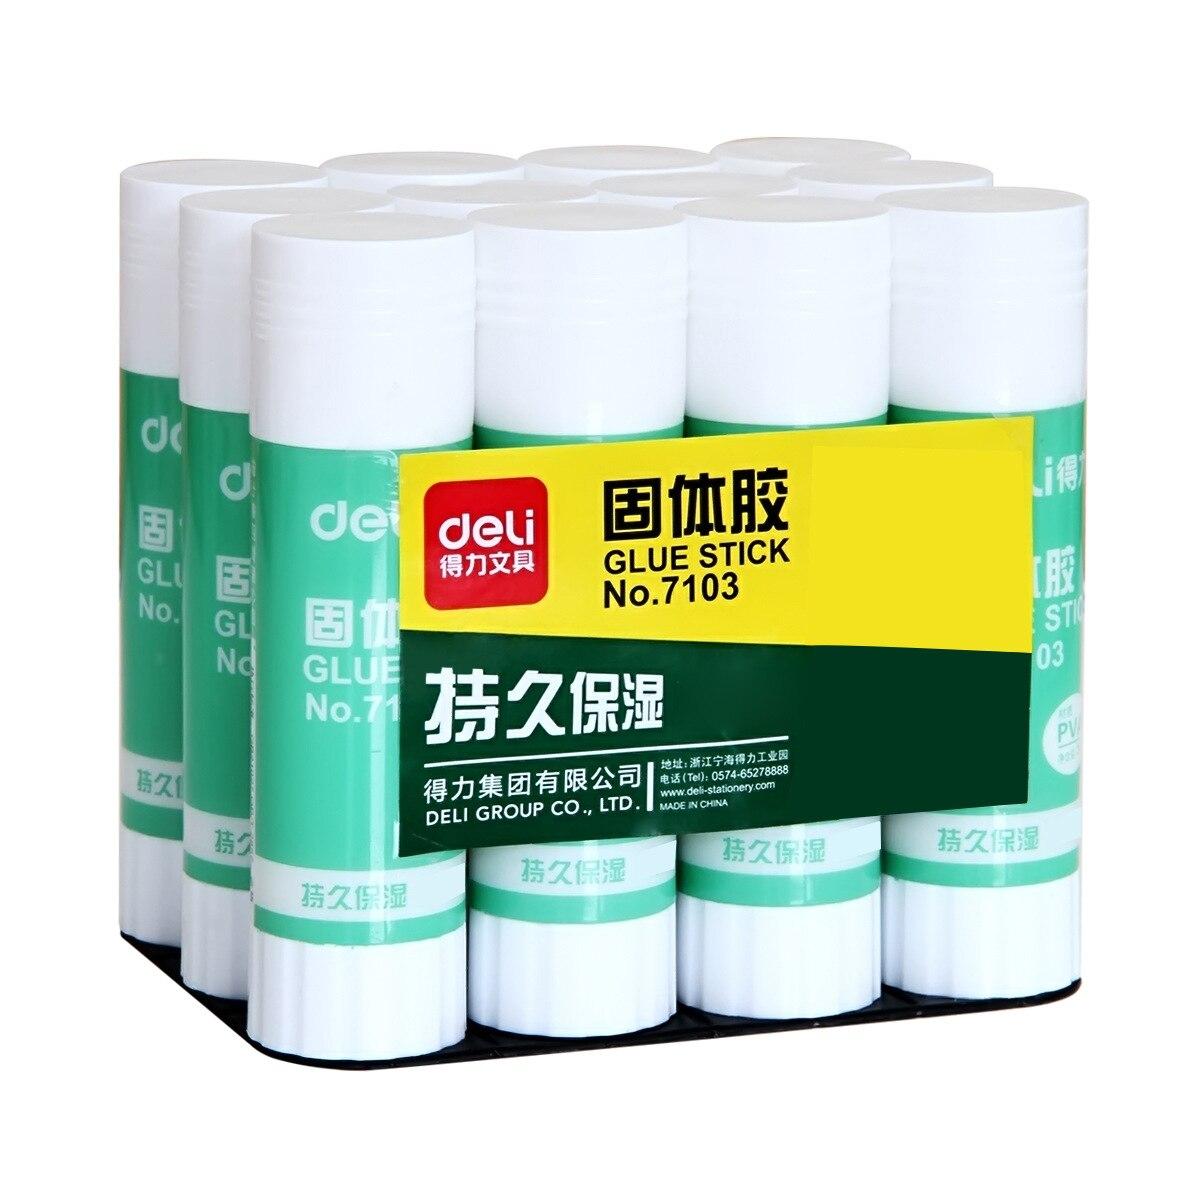 Wholesale Deli 7103 Solid Glue 36G Handmade Glue Solid Glue Stick Large Size